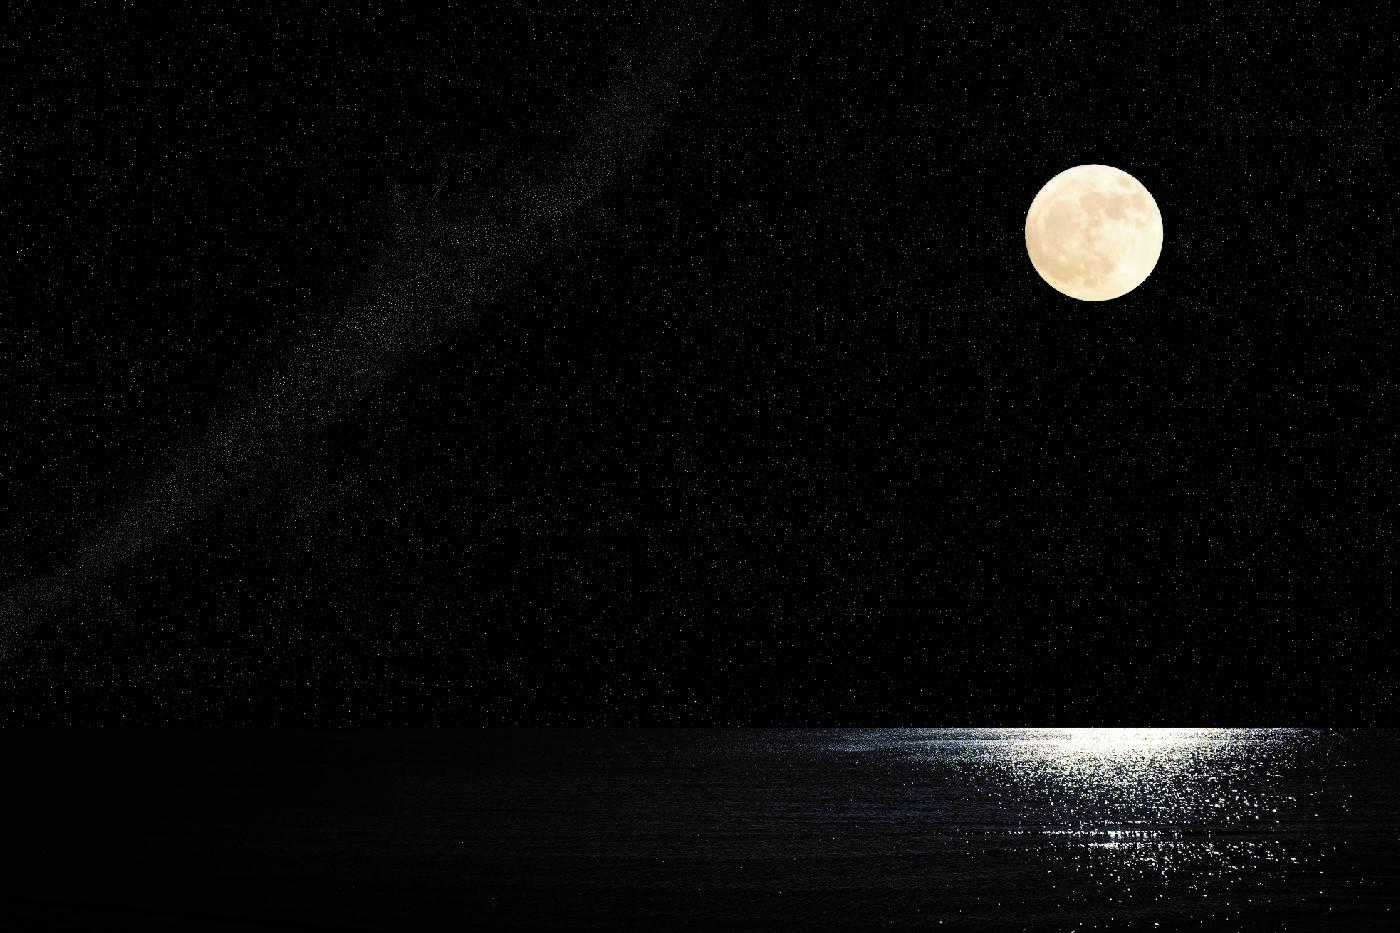 Lunar cycle moon over sea